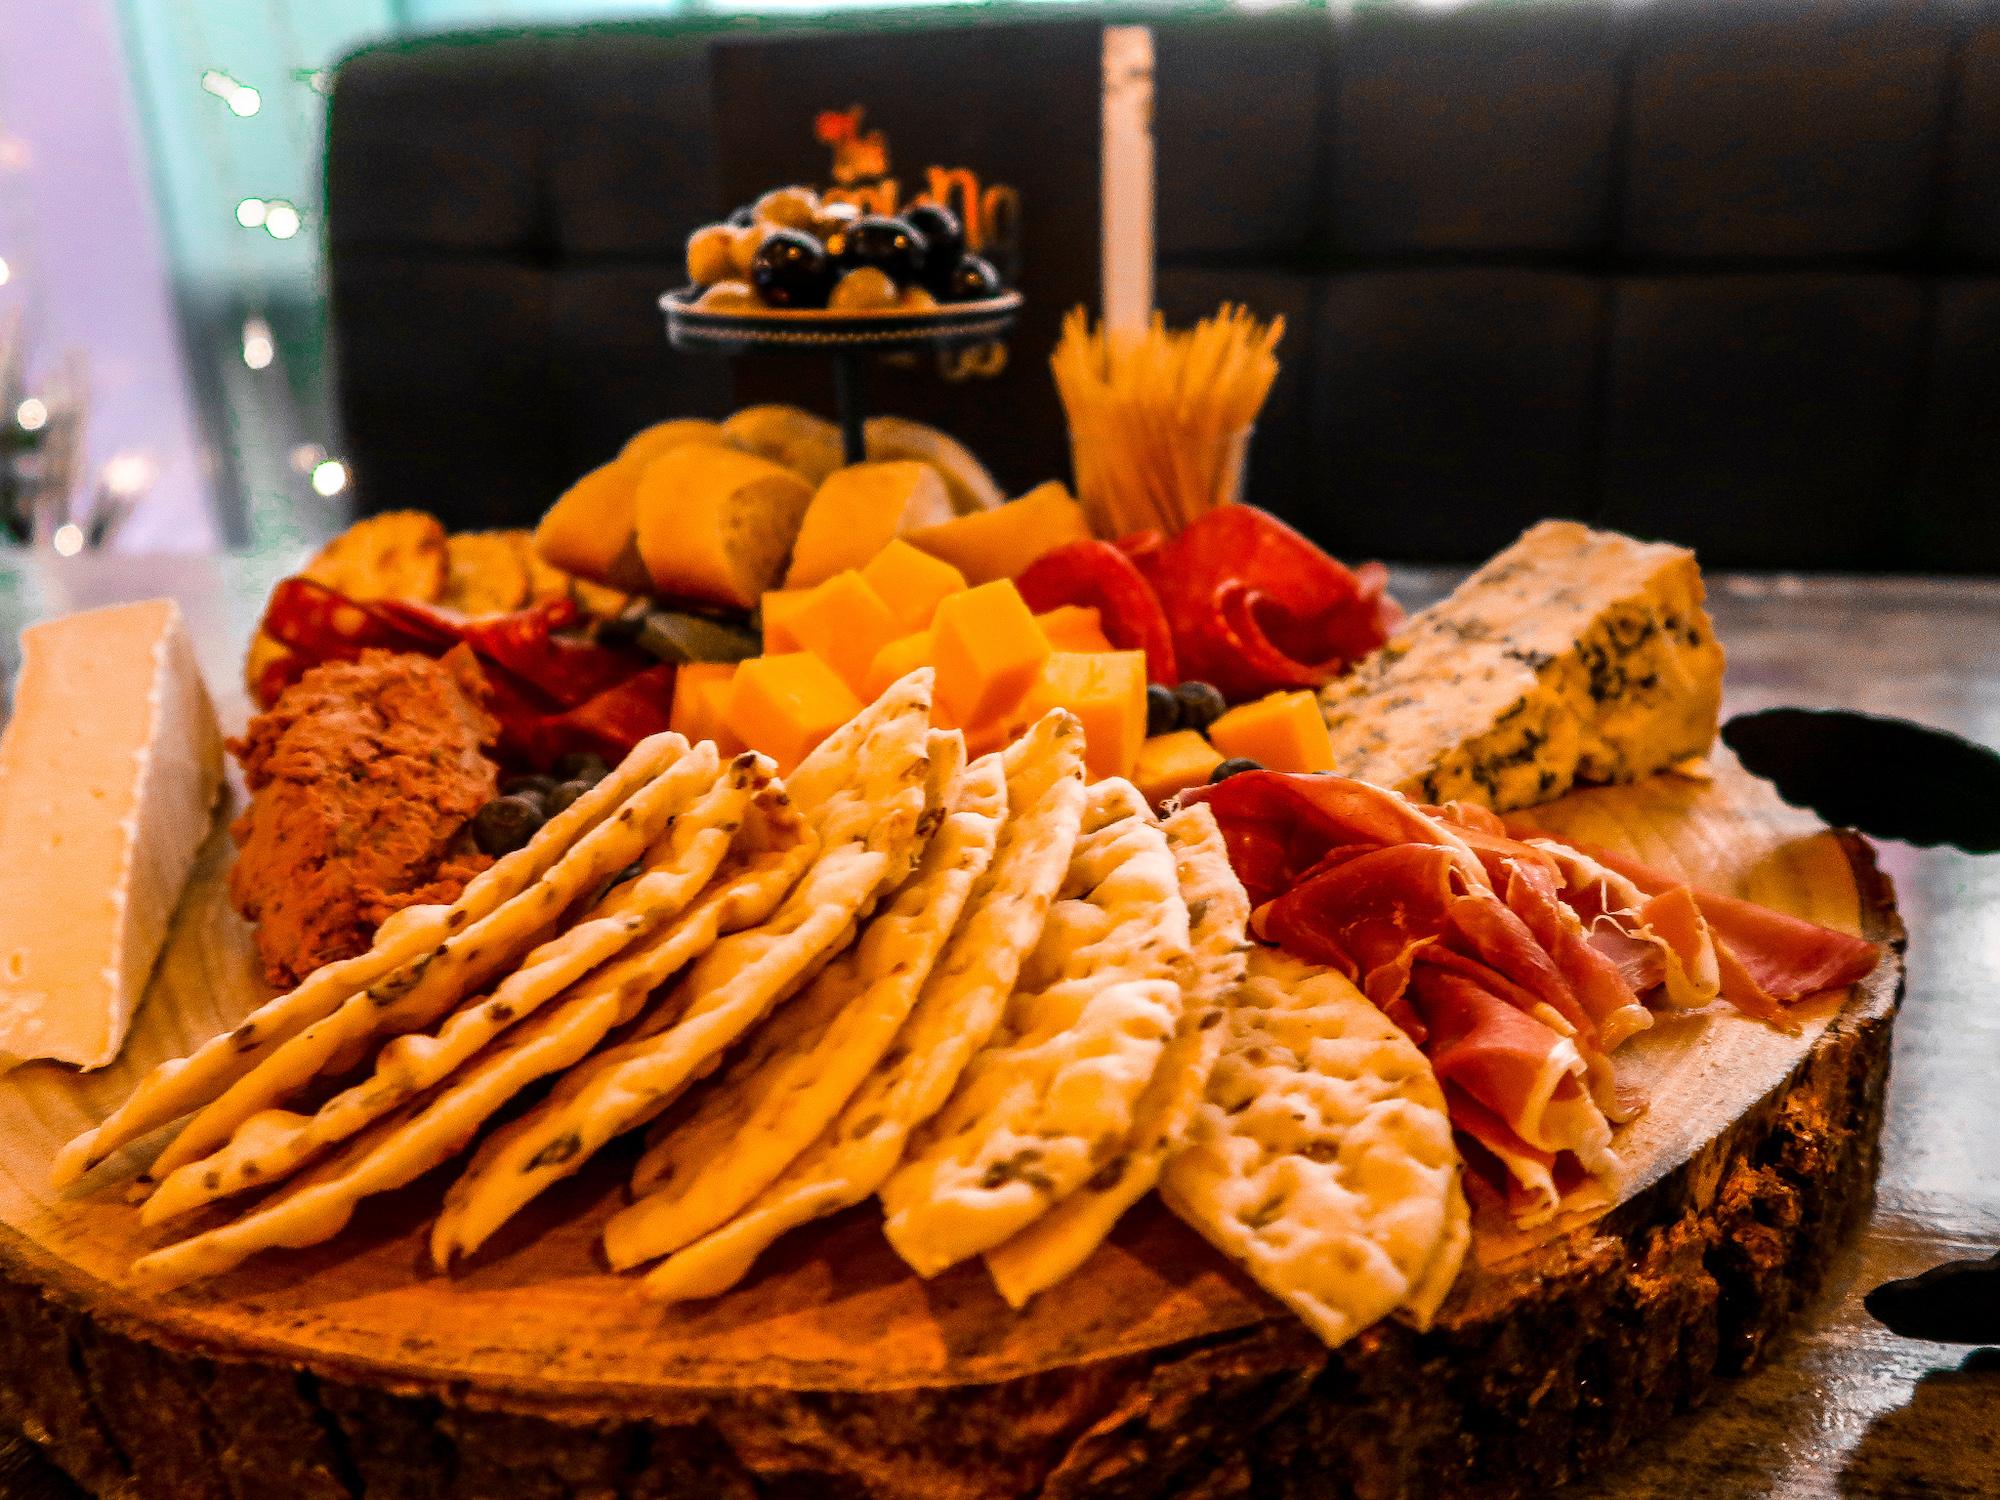 The Looking Glass Sharing Board | Sunderland Restaurant Week | Where to eat in Sunderland | Elle Blonde Luxury Lifestyle Destination Blog